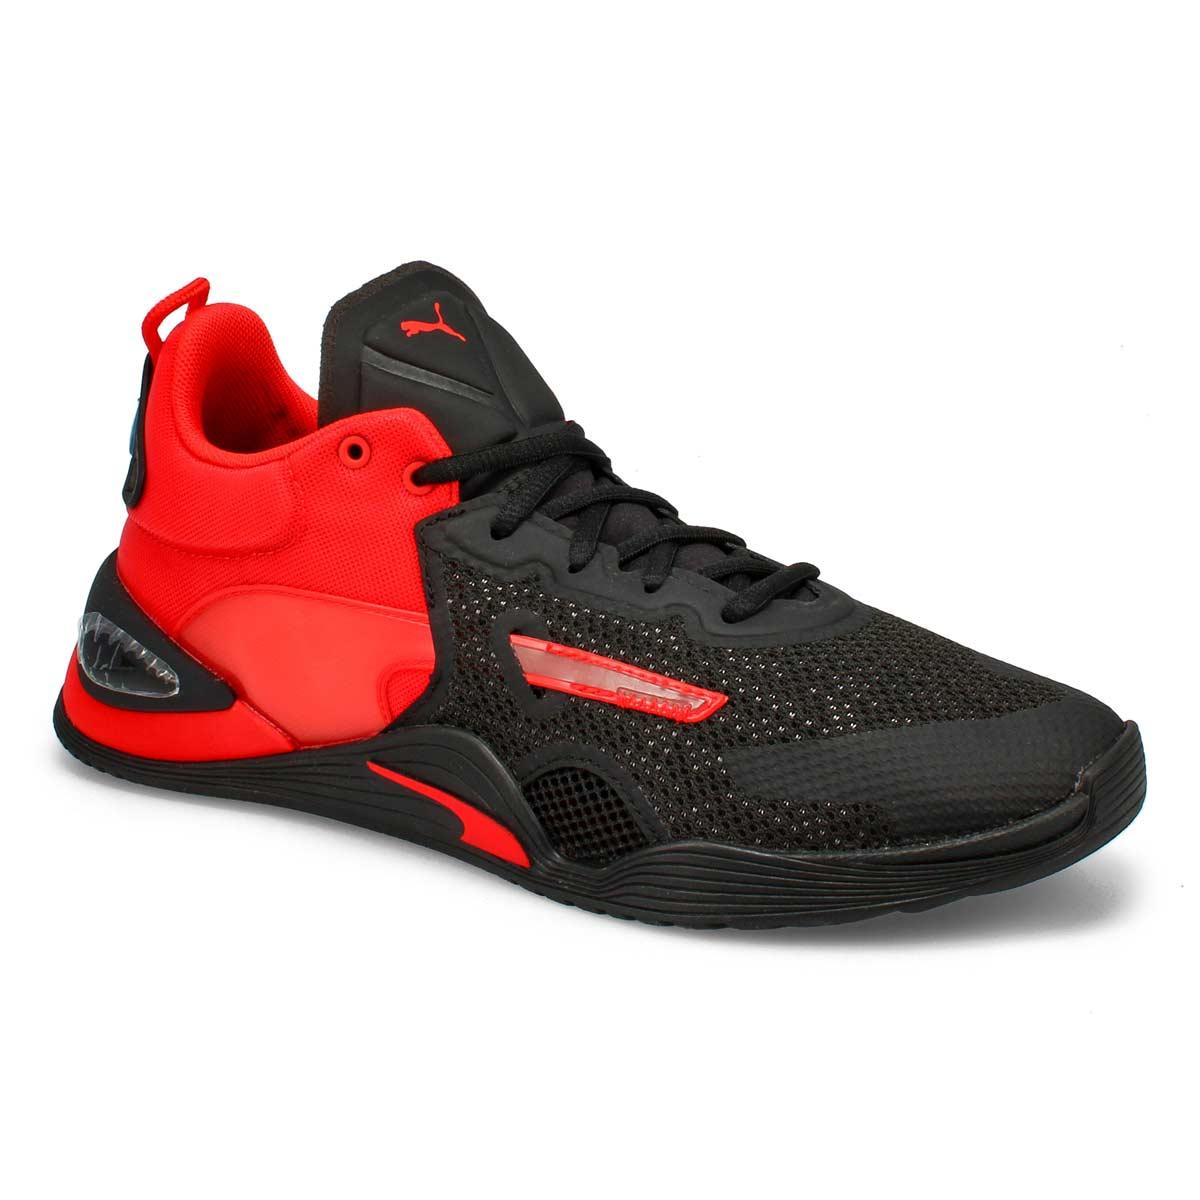 Men's Fuse Sneaker - Poppy red/black